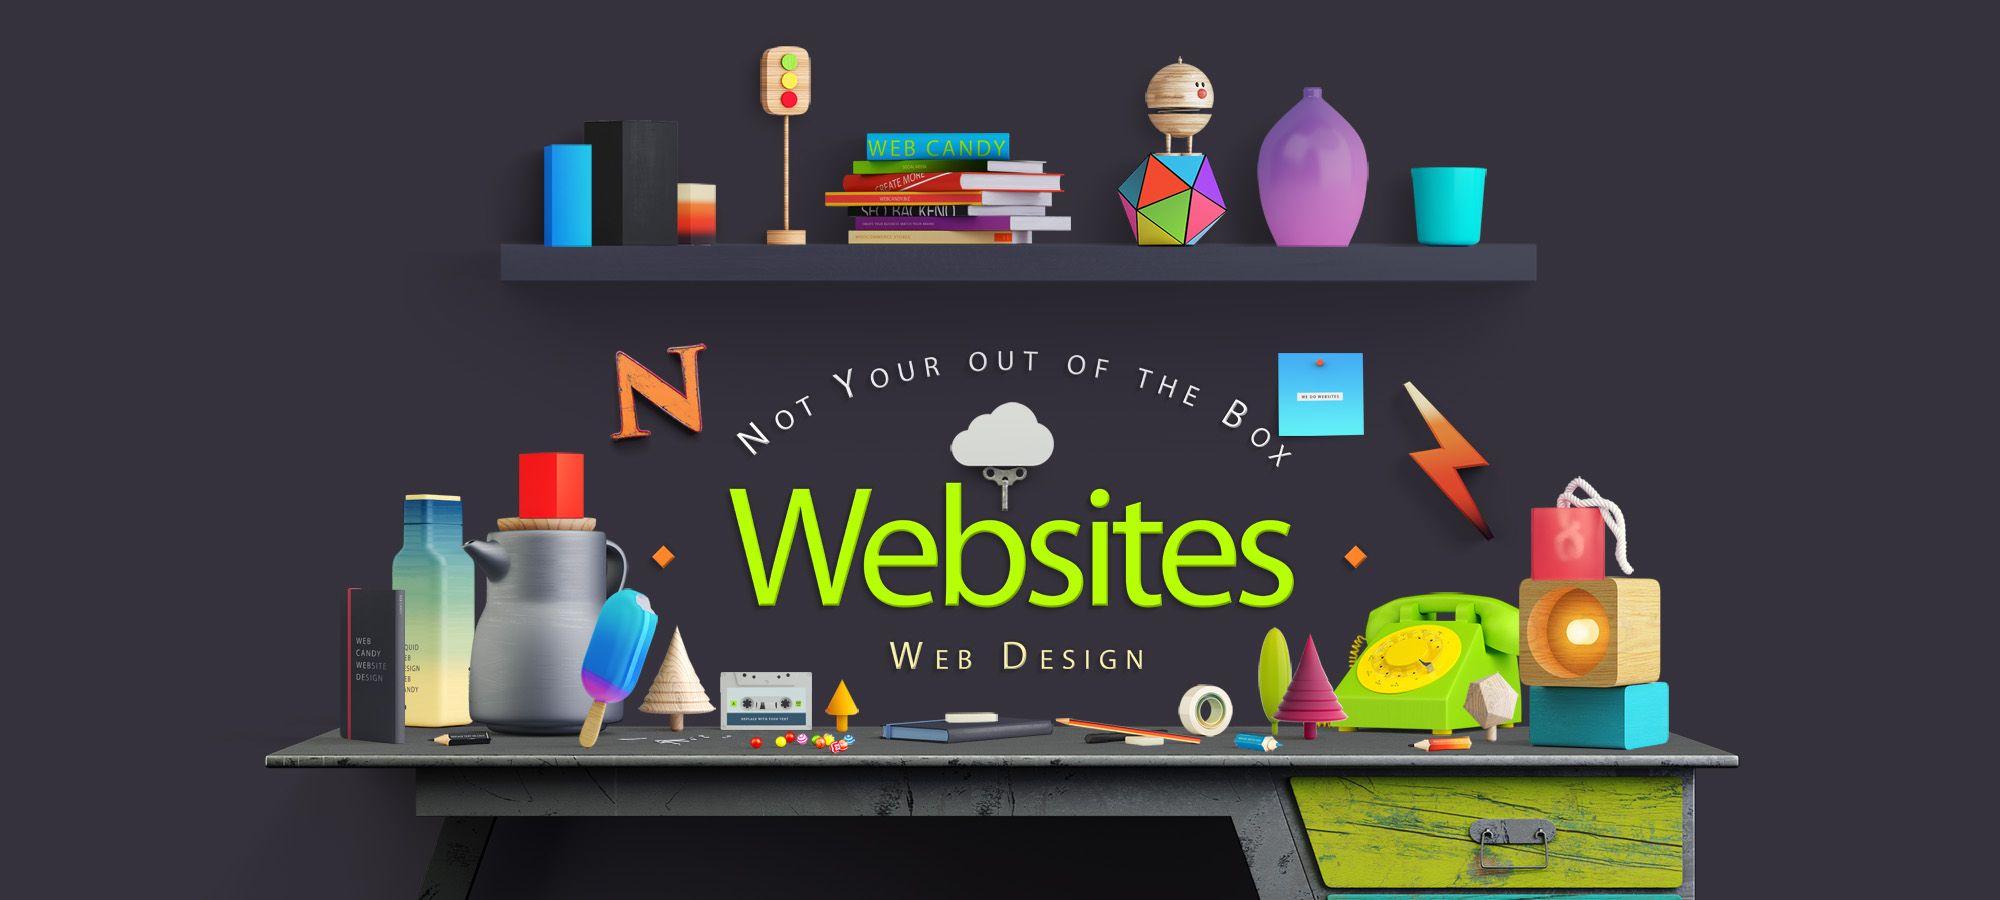 Can You Really Make Money Blogging Check Out I Love Blogging And Making Money Kanoobi Makemo Professional Website Design Web Development Design Web Design